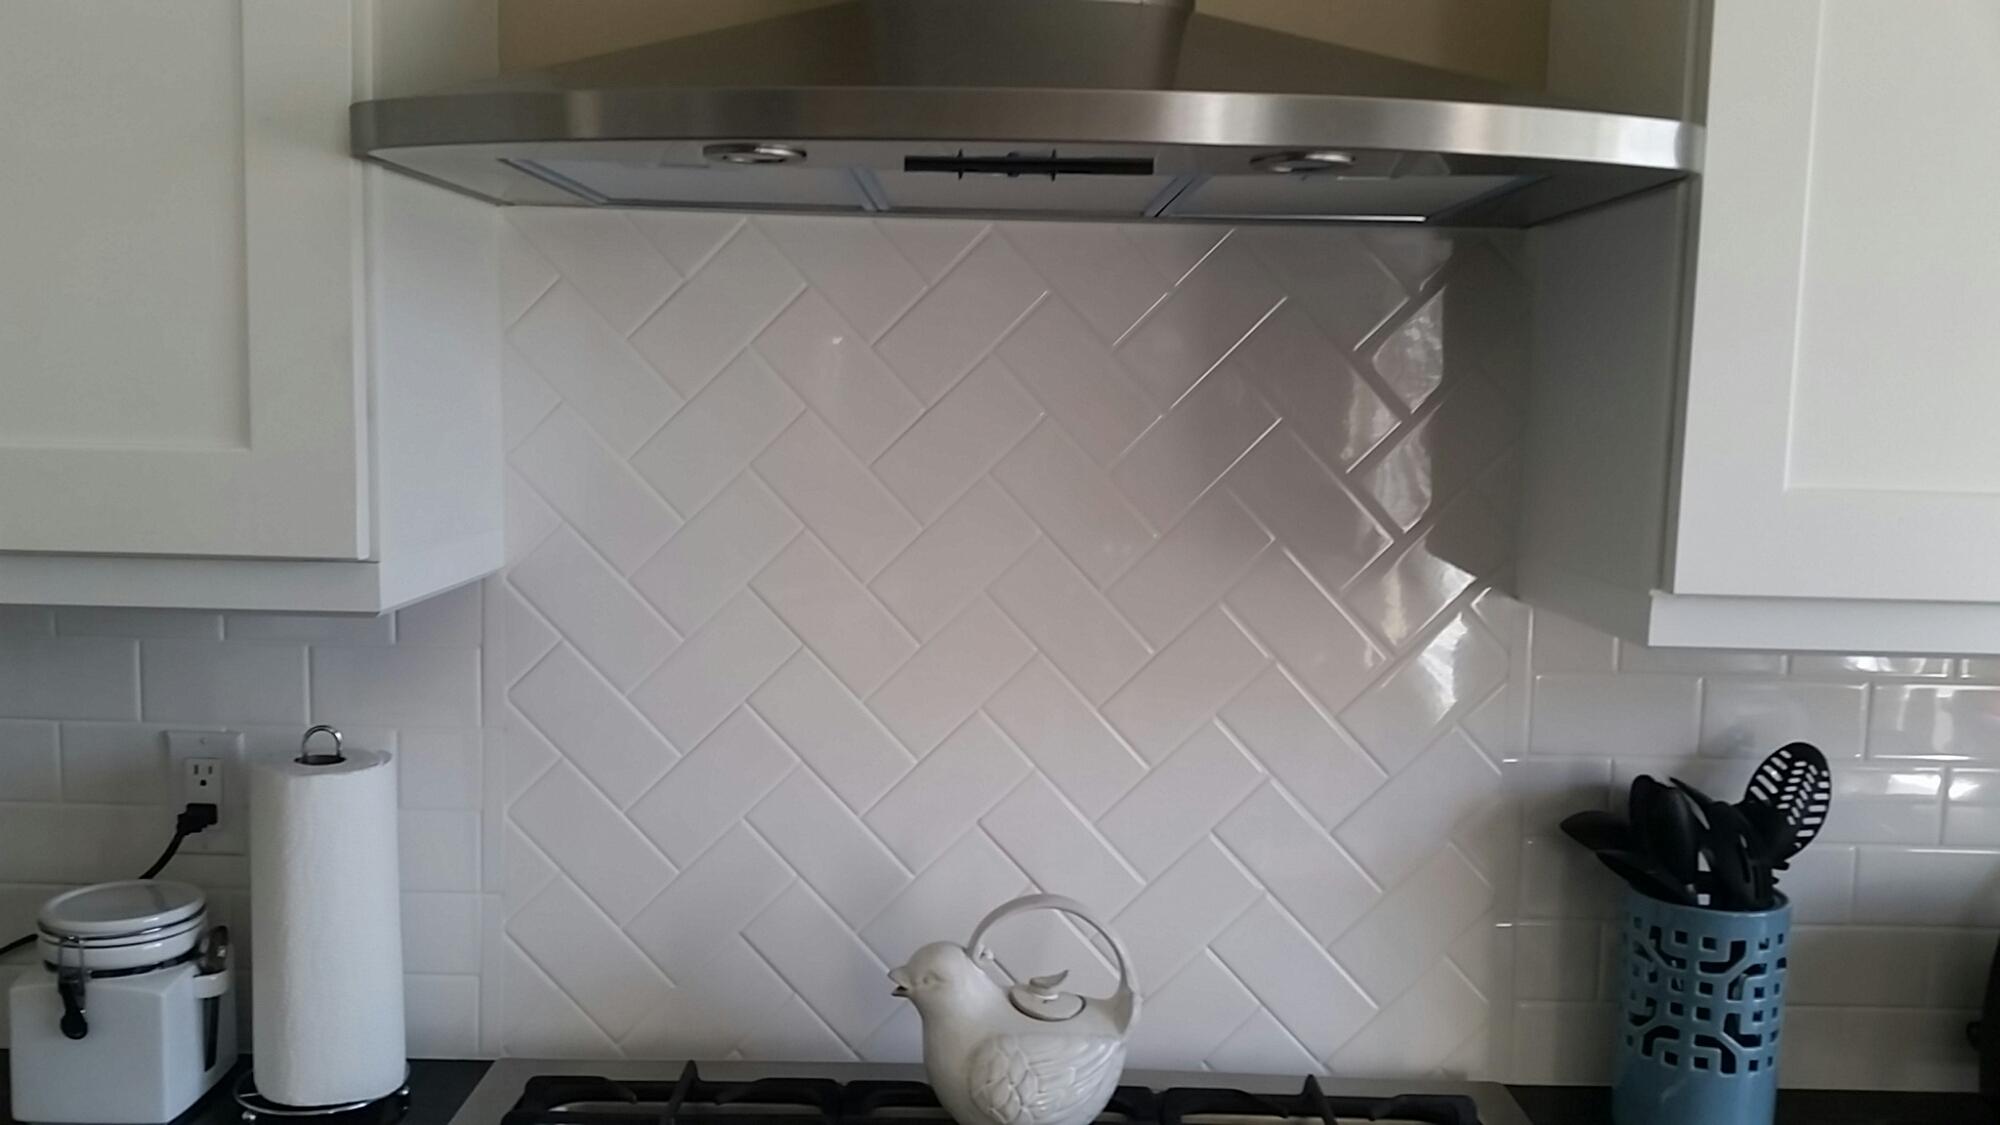 love the subway tile backsplash done in a herringbone pattern it